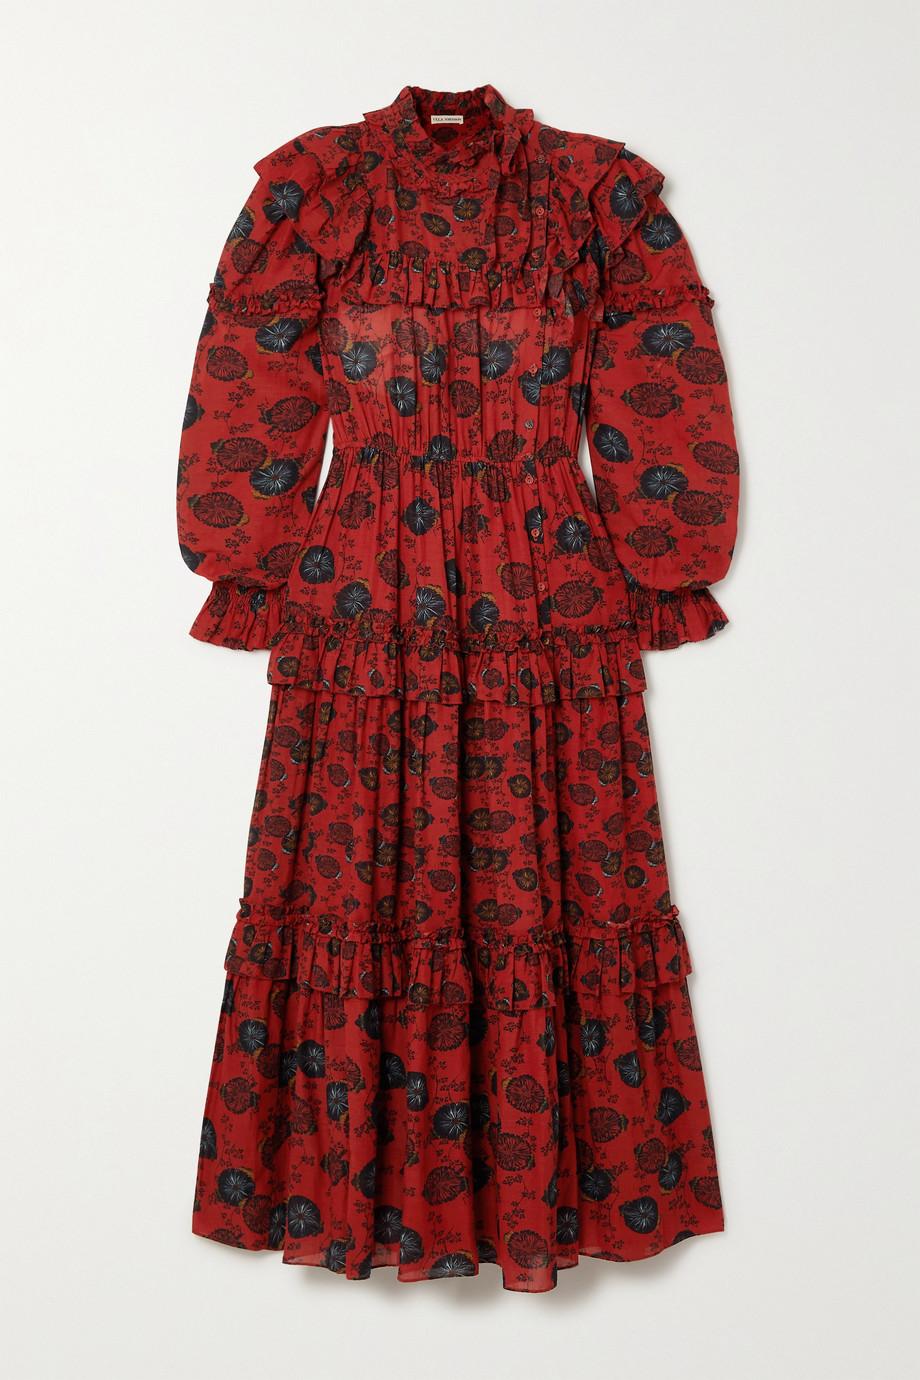 Ulla Johnson Winnifred belted tiered floral-print cotton-blend dress